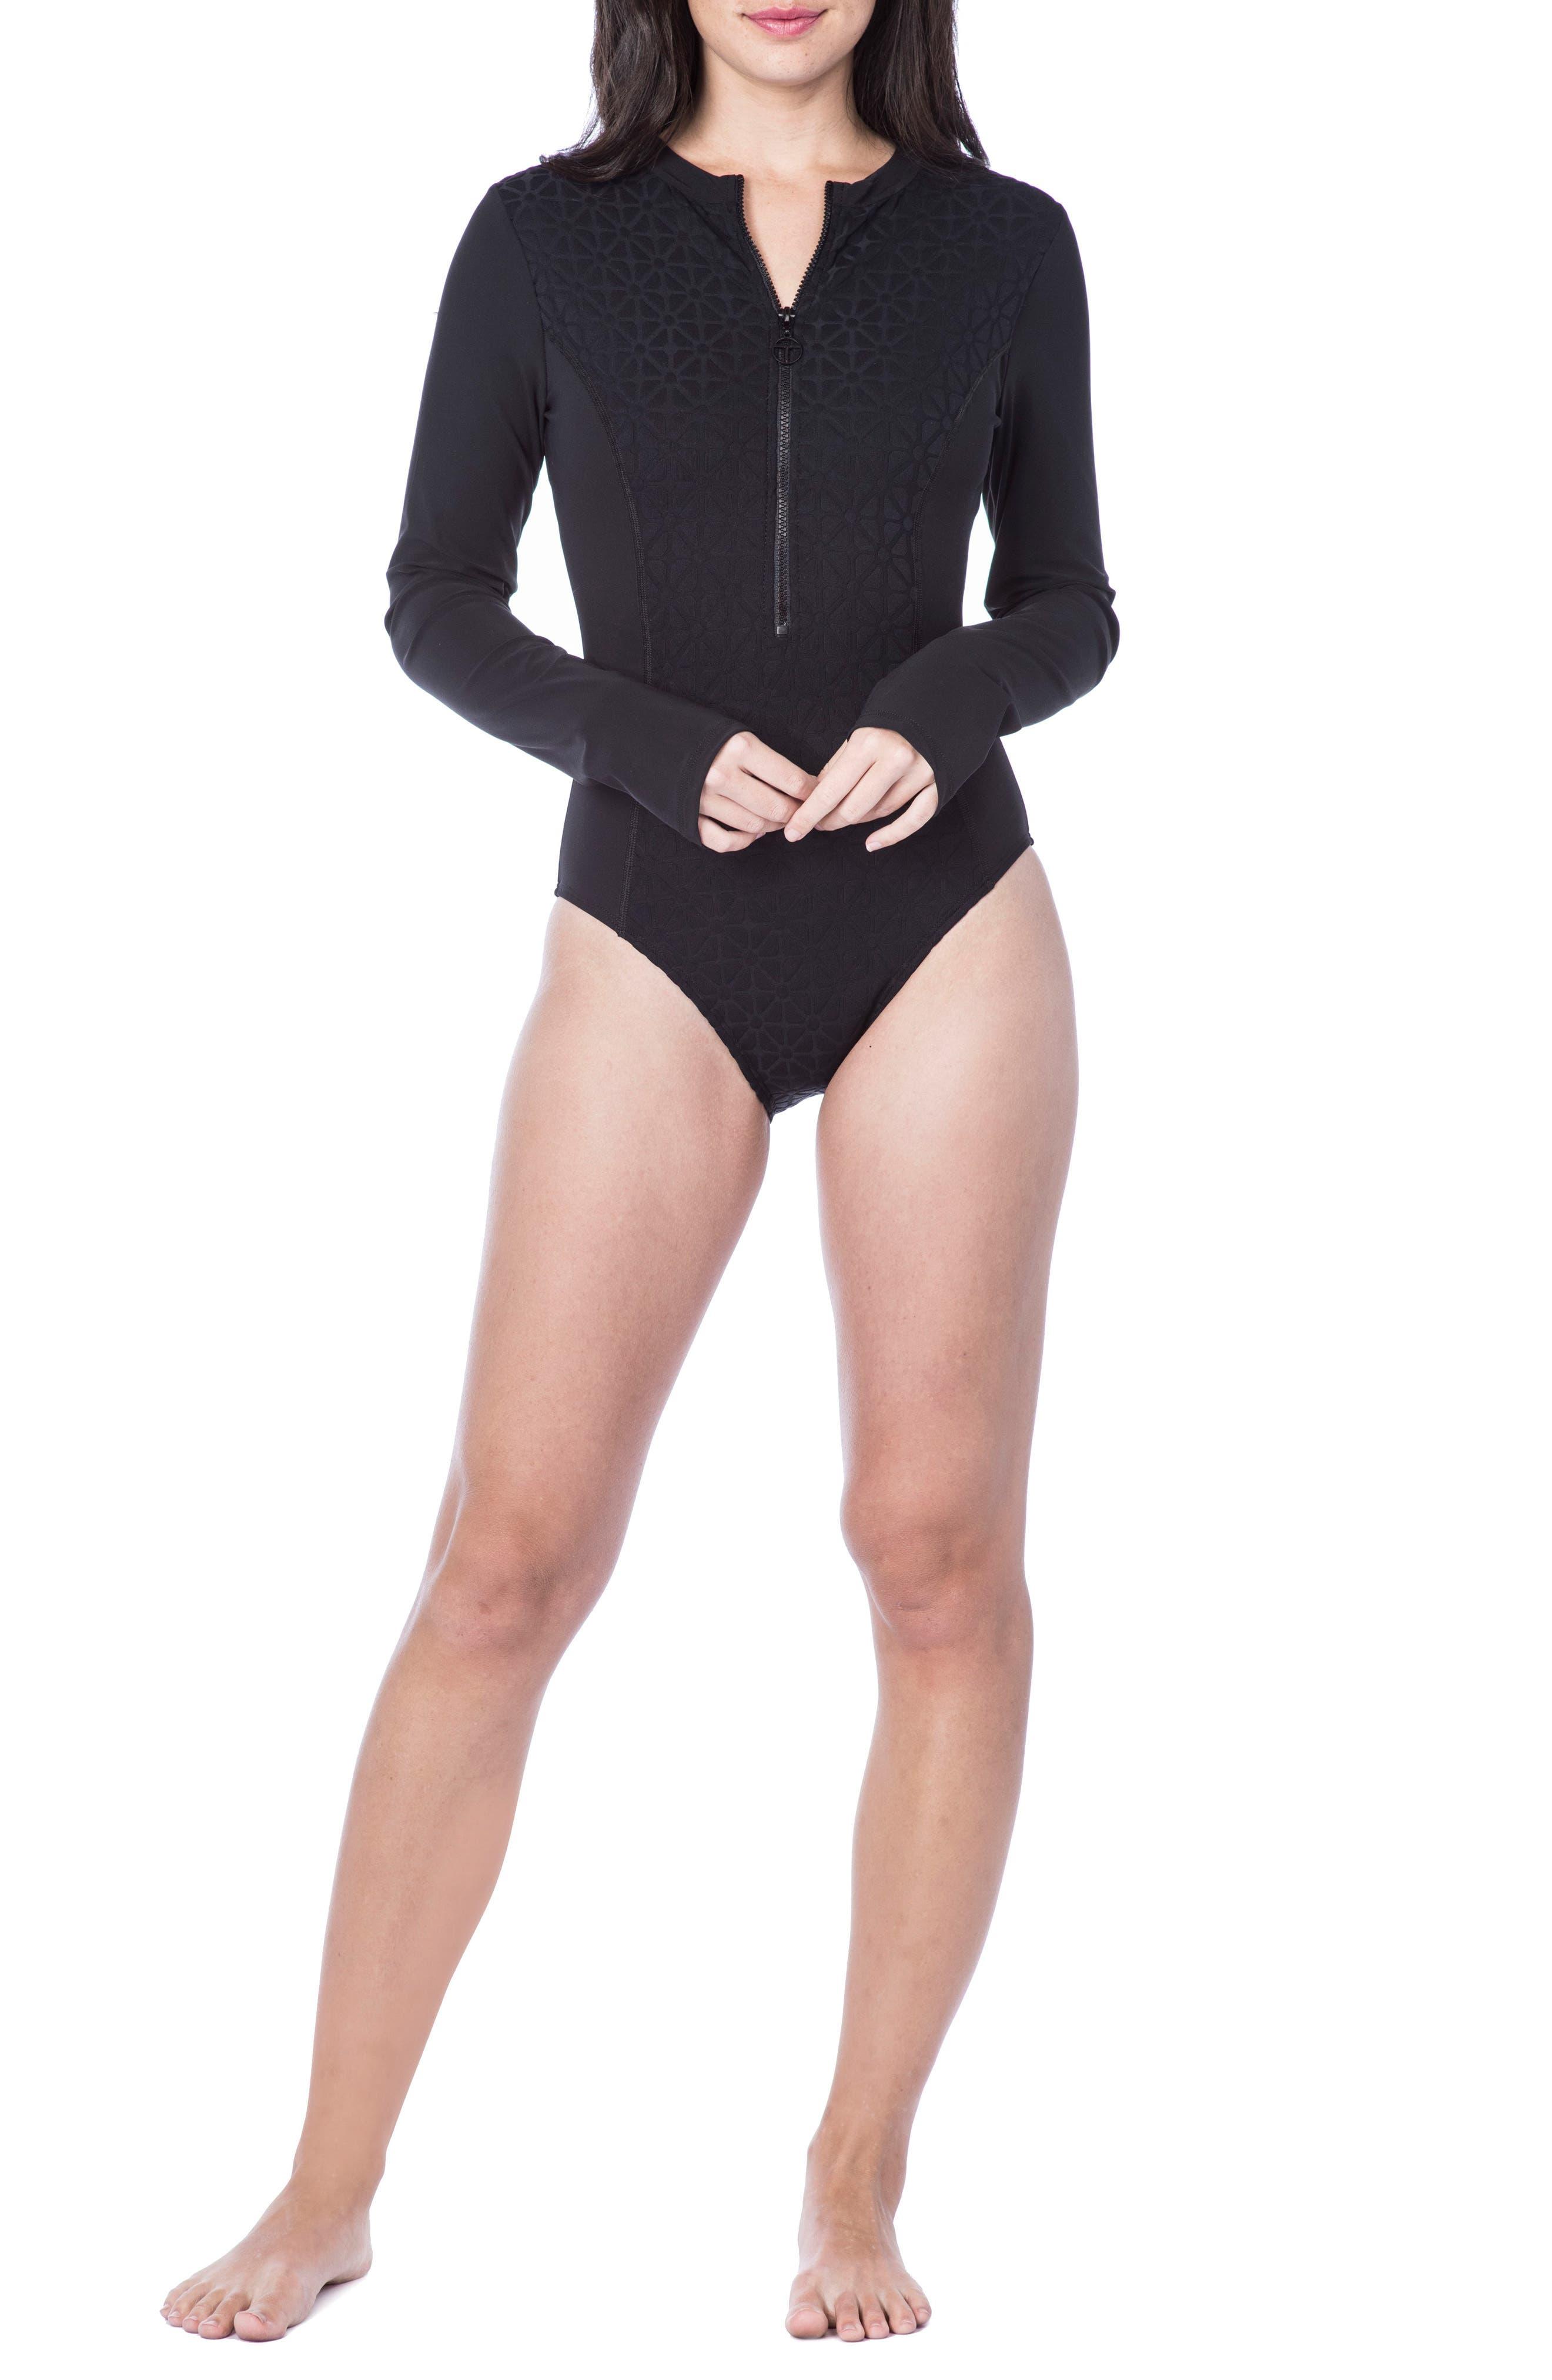 Main Image - Trina Turk Sunshine Jacquard One-Piece Paddle Suit